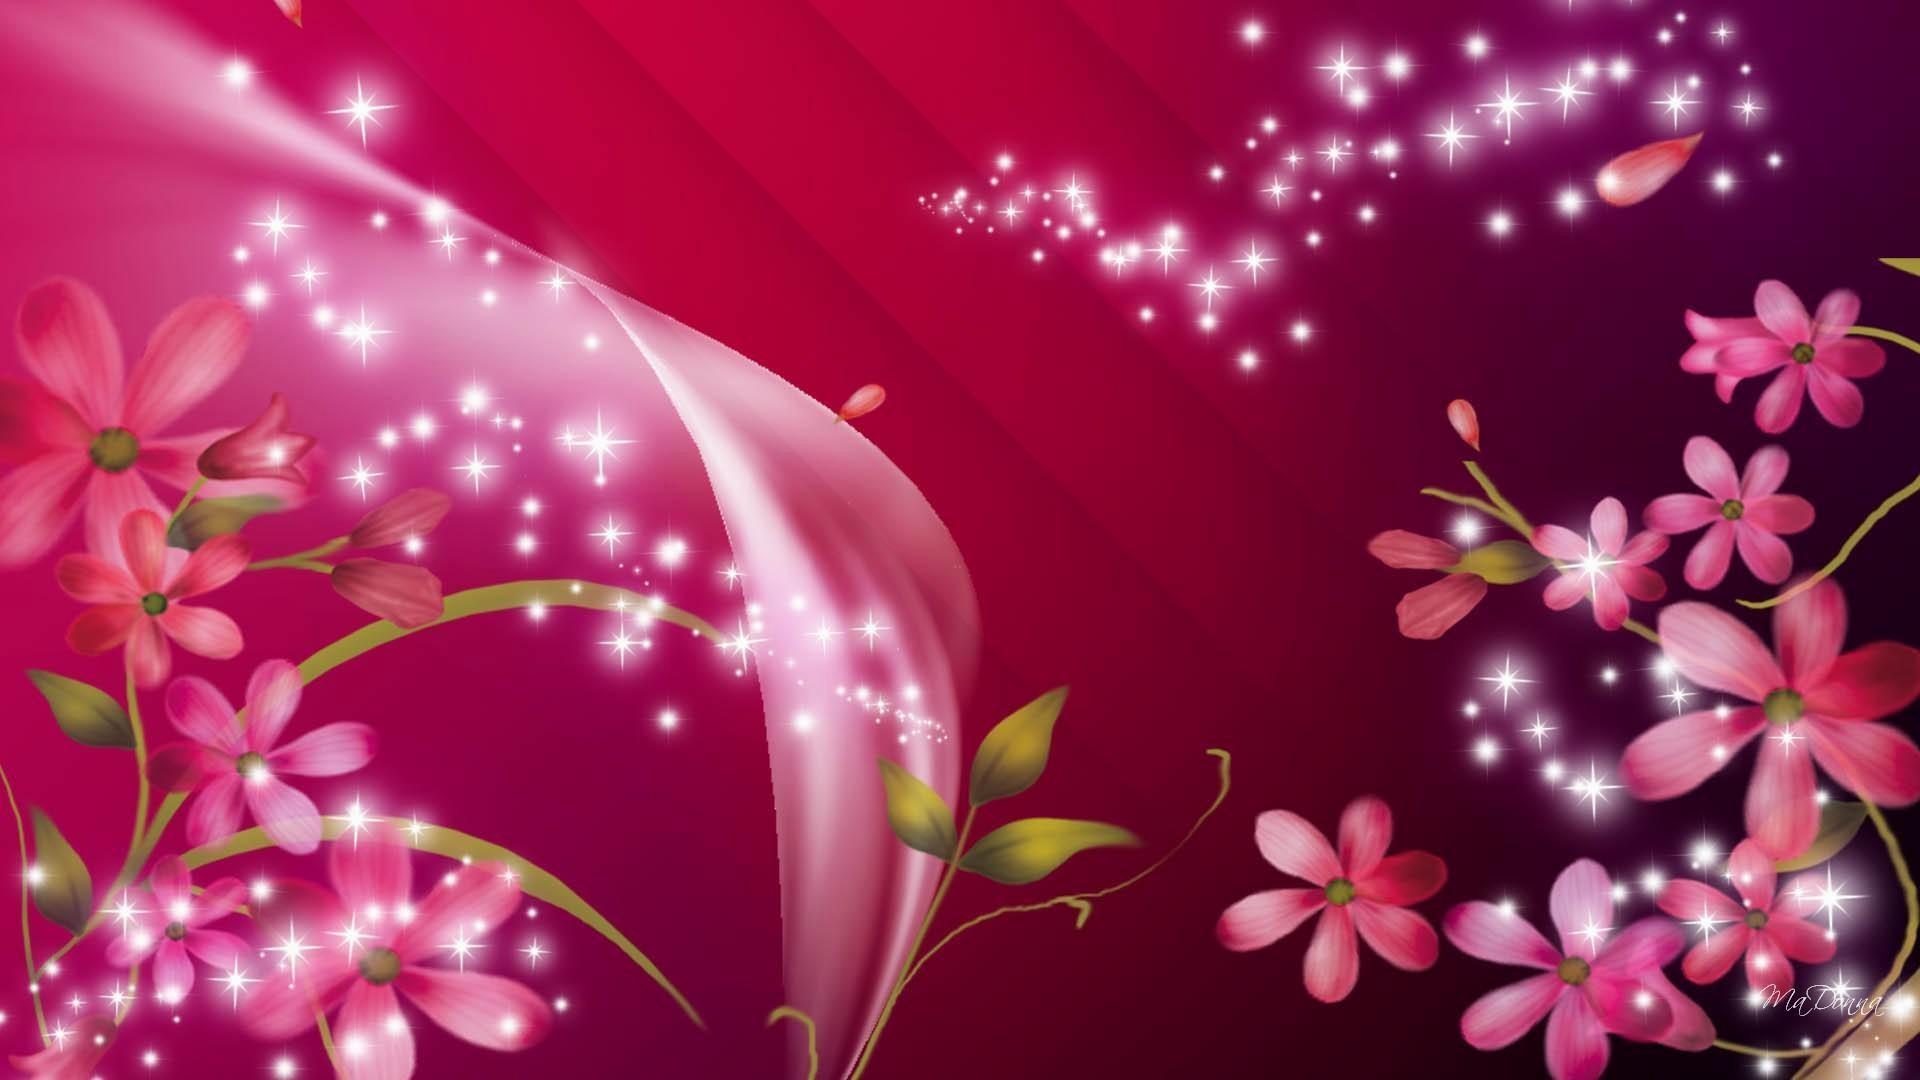 Res: 1920x1080, 6. pink-glitter-wallpaper6-600x338